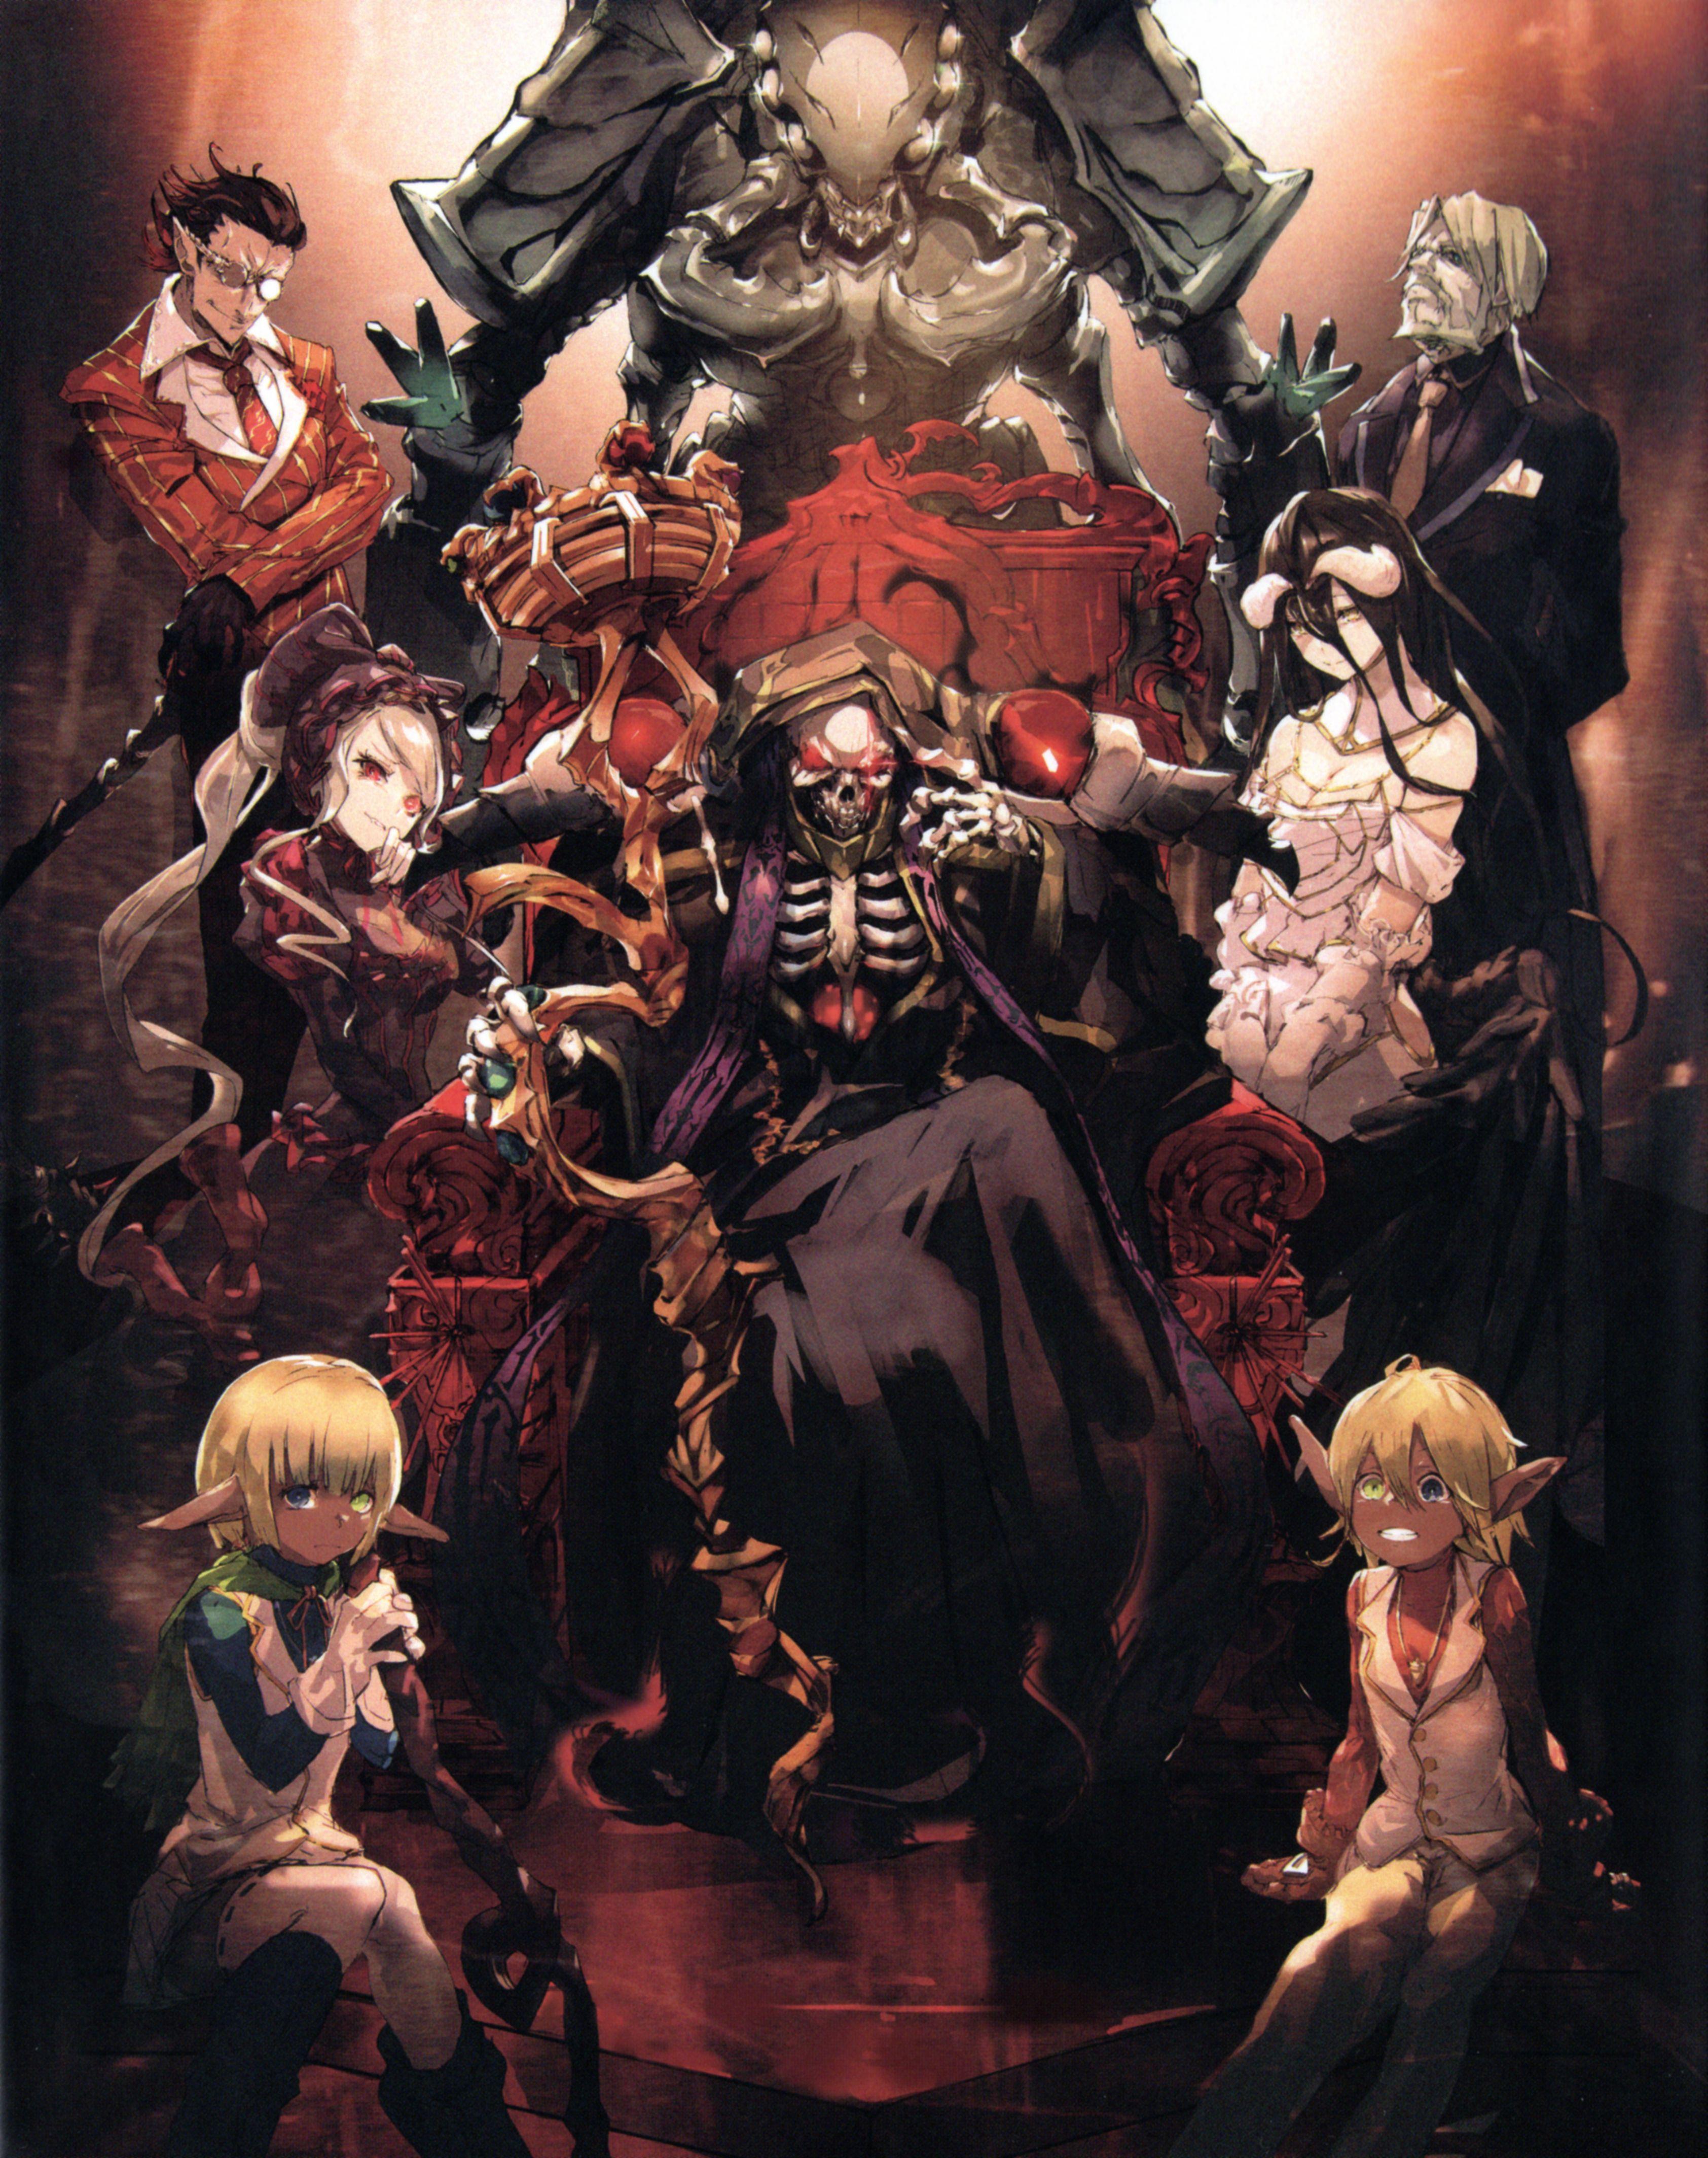 So-bin, Overlord (Series), Cocytus, Albedo (Overlord), Mare Bello